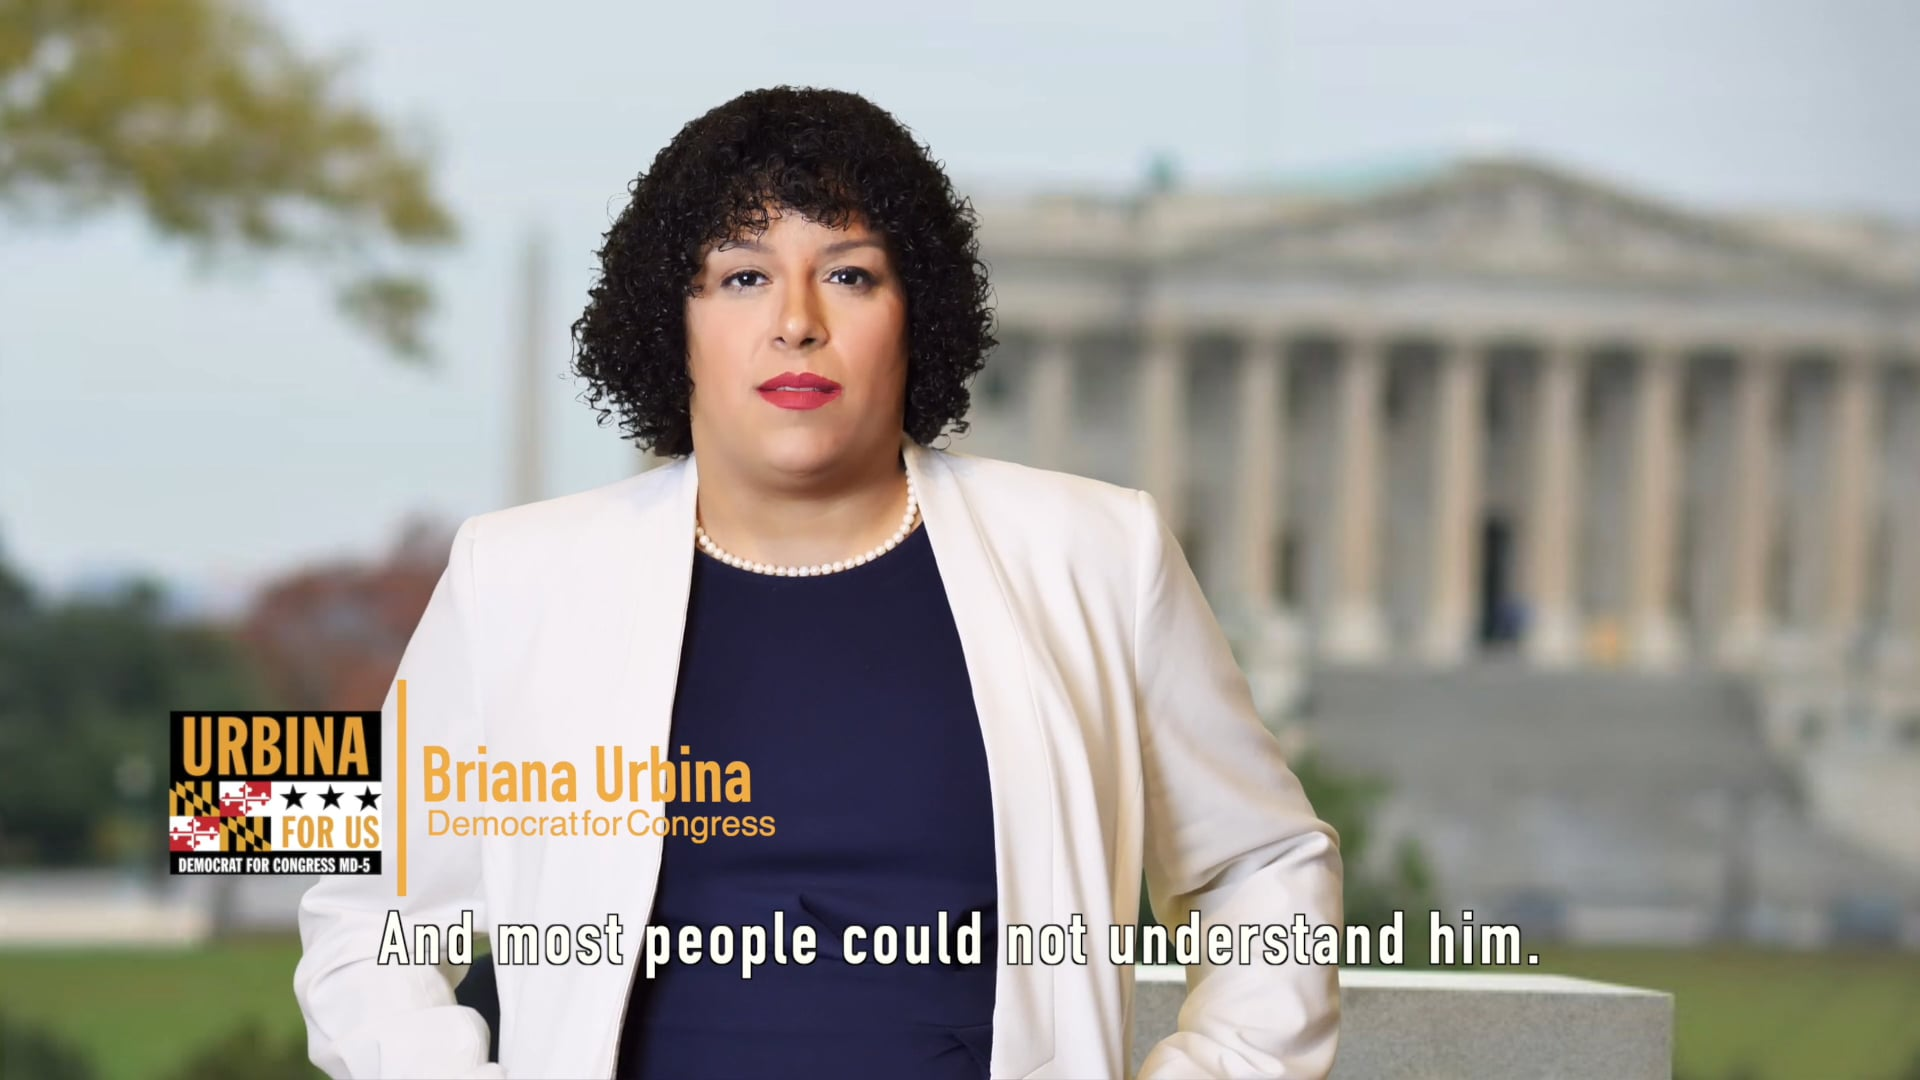 Campaign Video_Briana Urbina